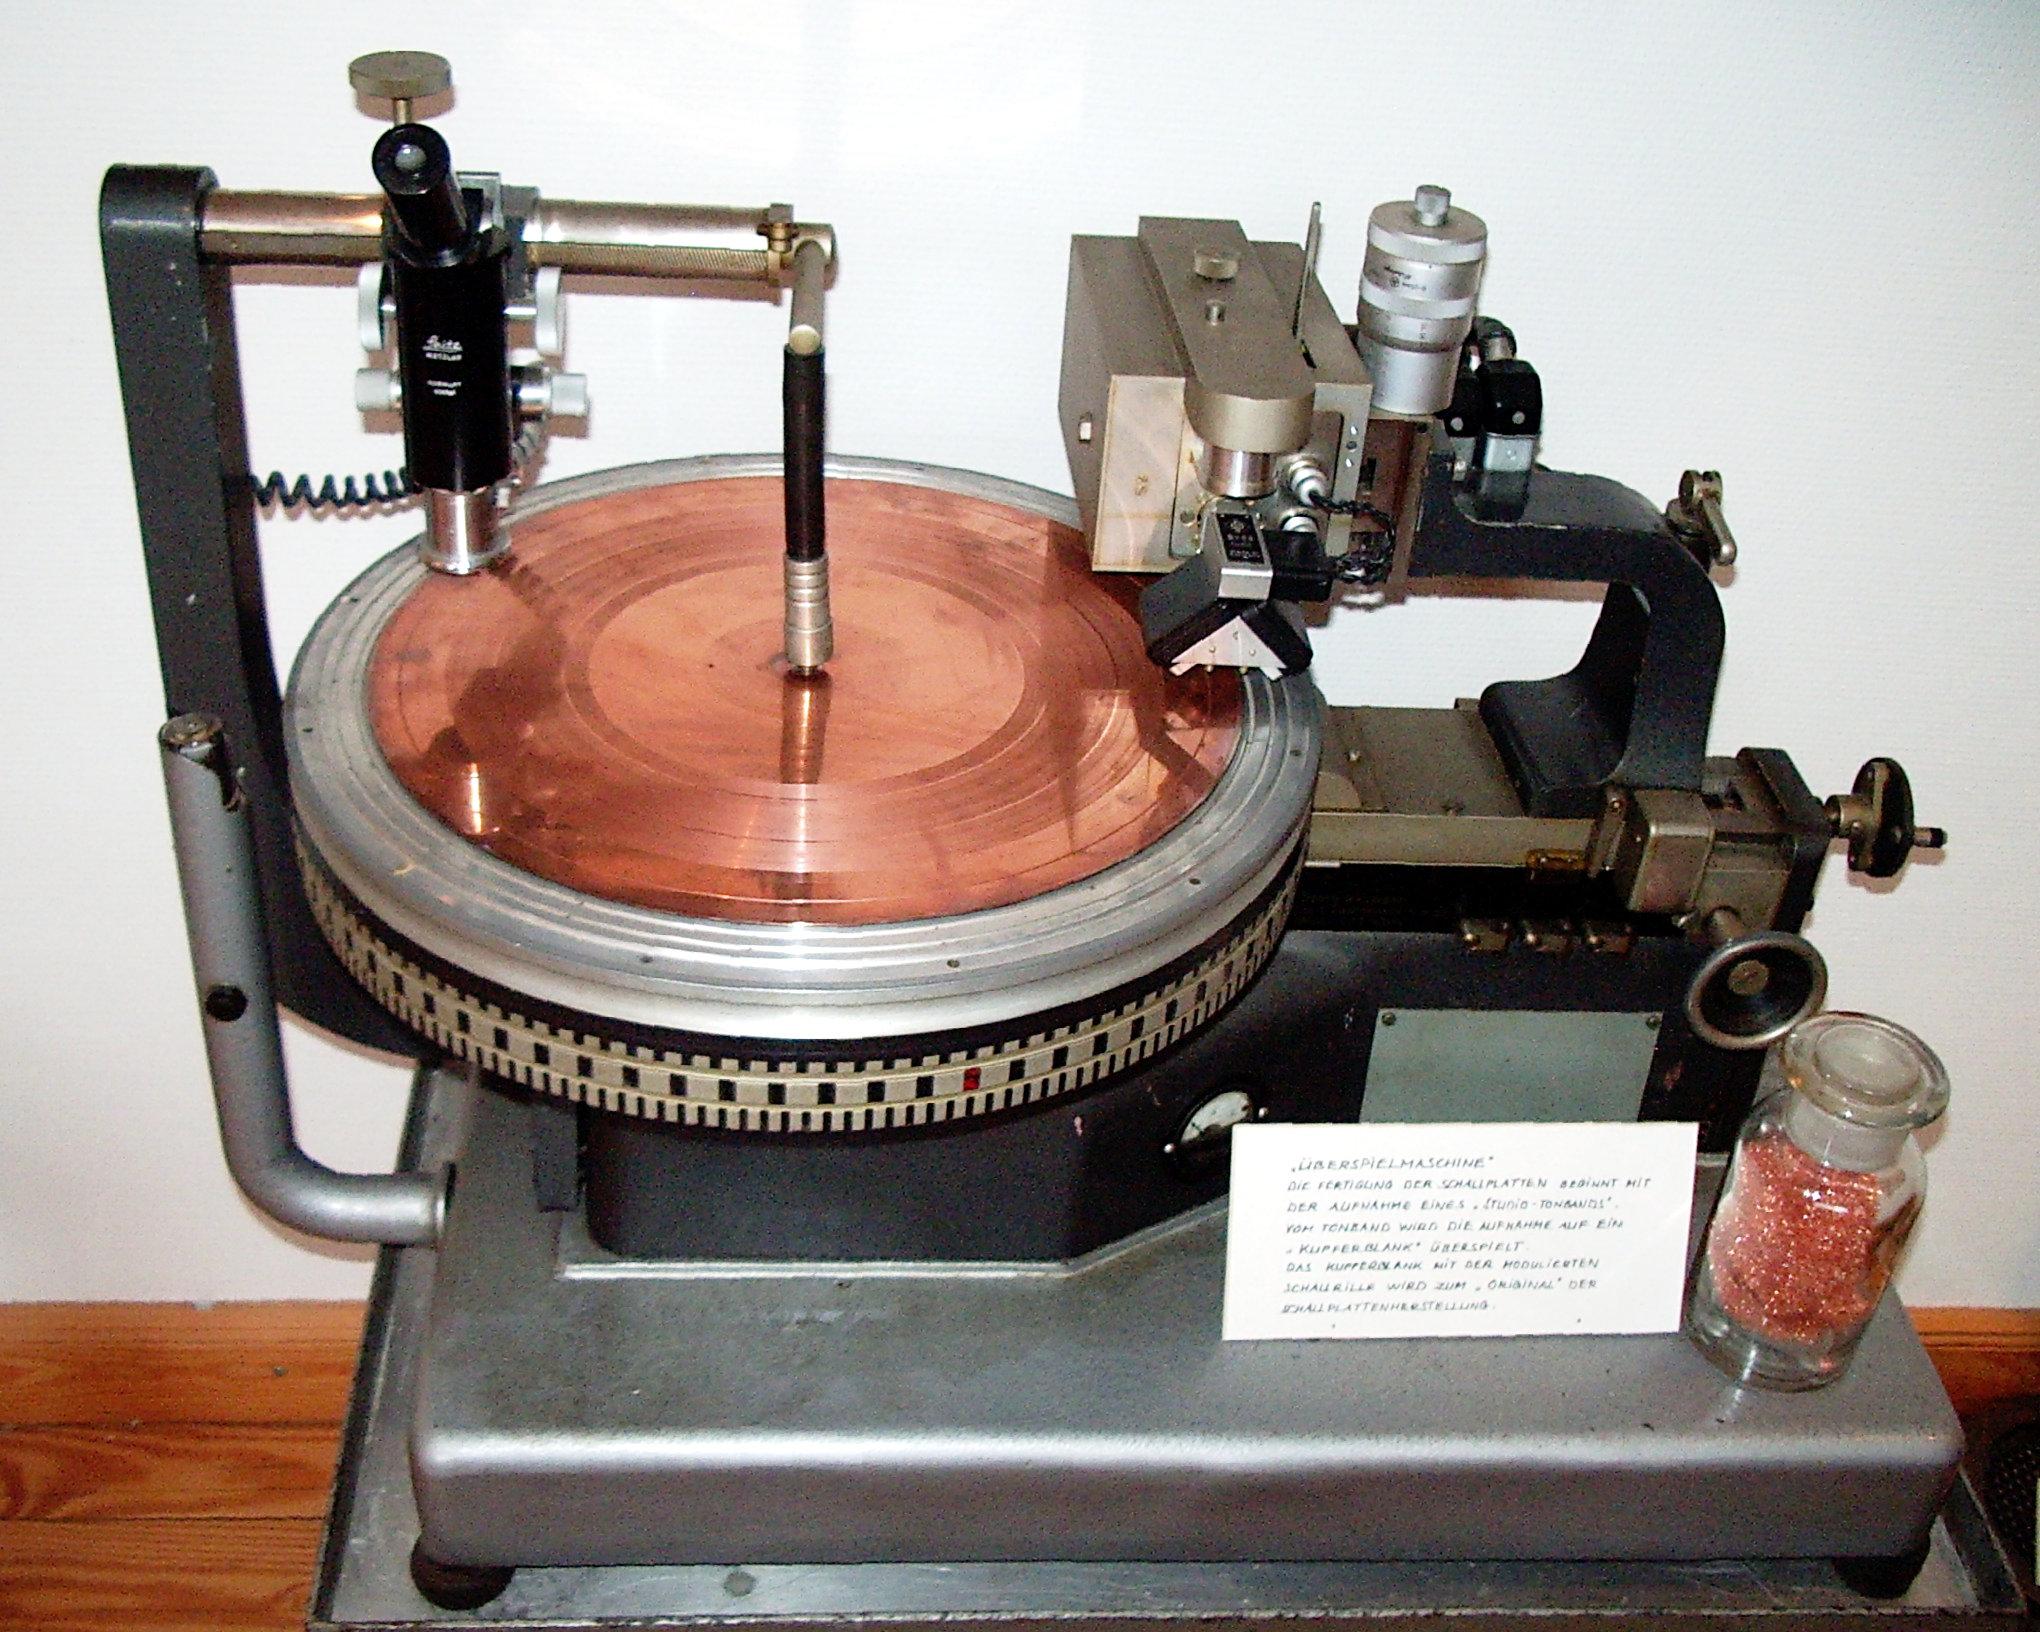 Datei Neumann Teldec Dmm Kupferfolien Schneidemaschine Jpg